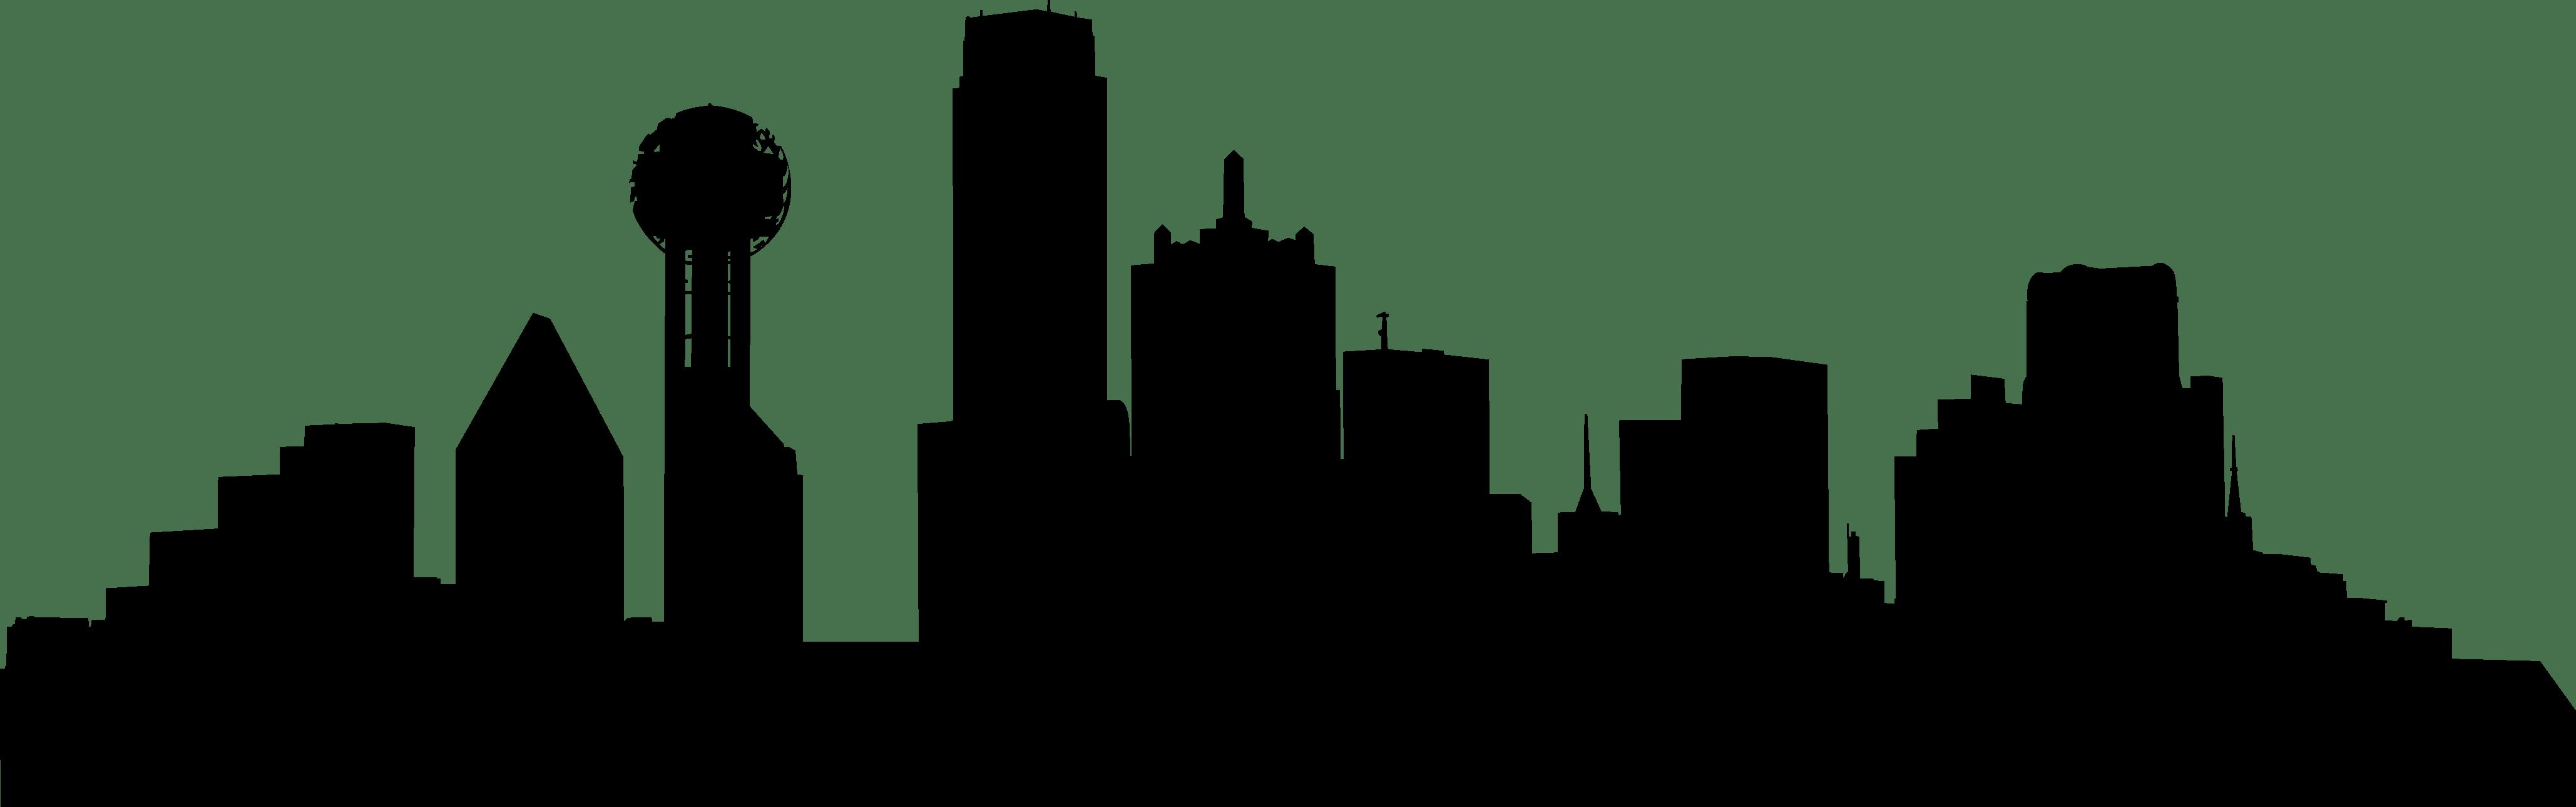 4116x1289 Simple Drawing Dallas Skyline